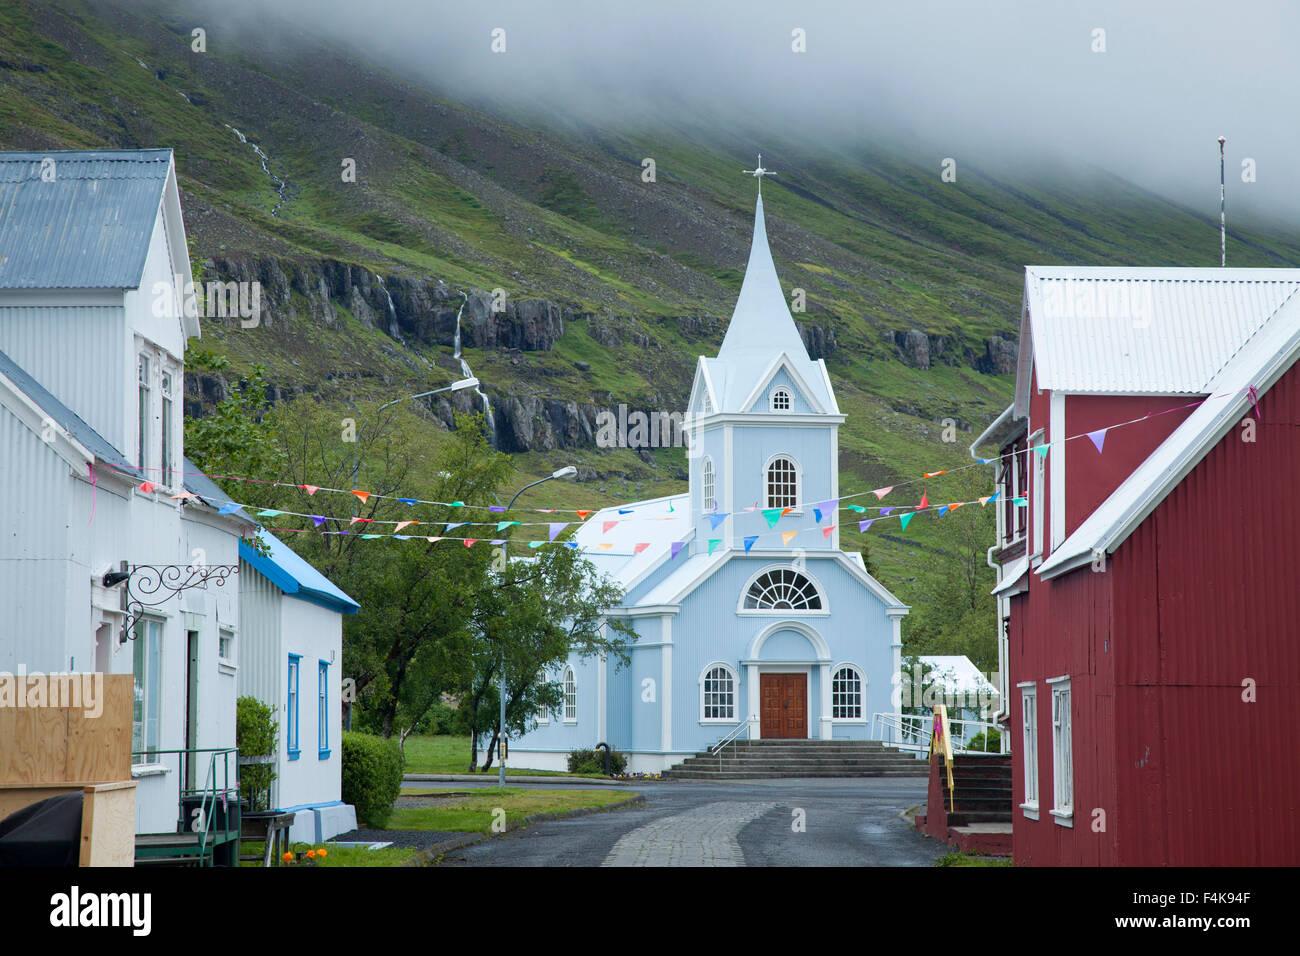 Iglesia tradicional en Seyðisfjörður Anuncios village, Austurland, Islandia. Imagen De Stock